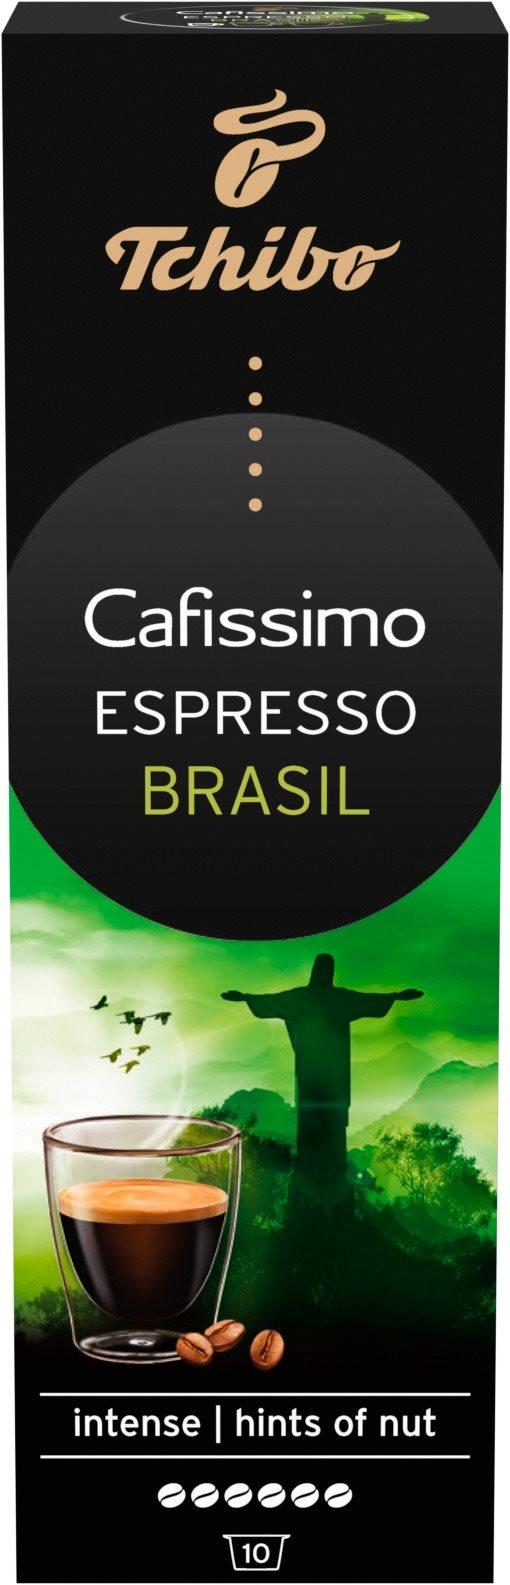 Tchibo Cafissimo Espresso Brazil 80g